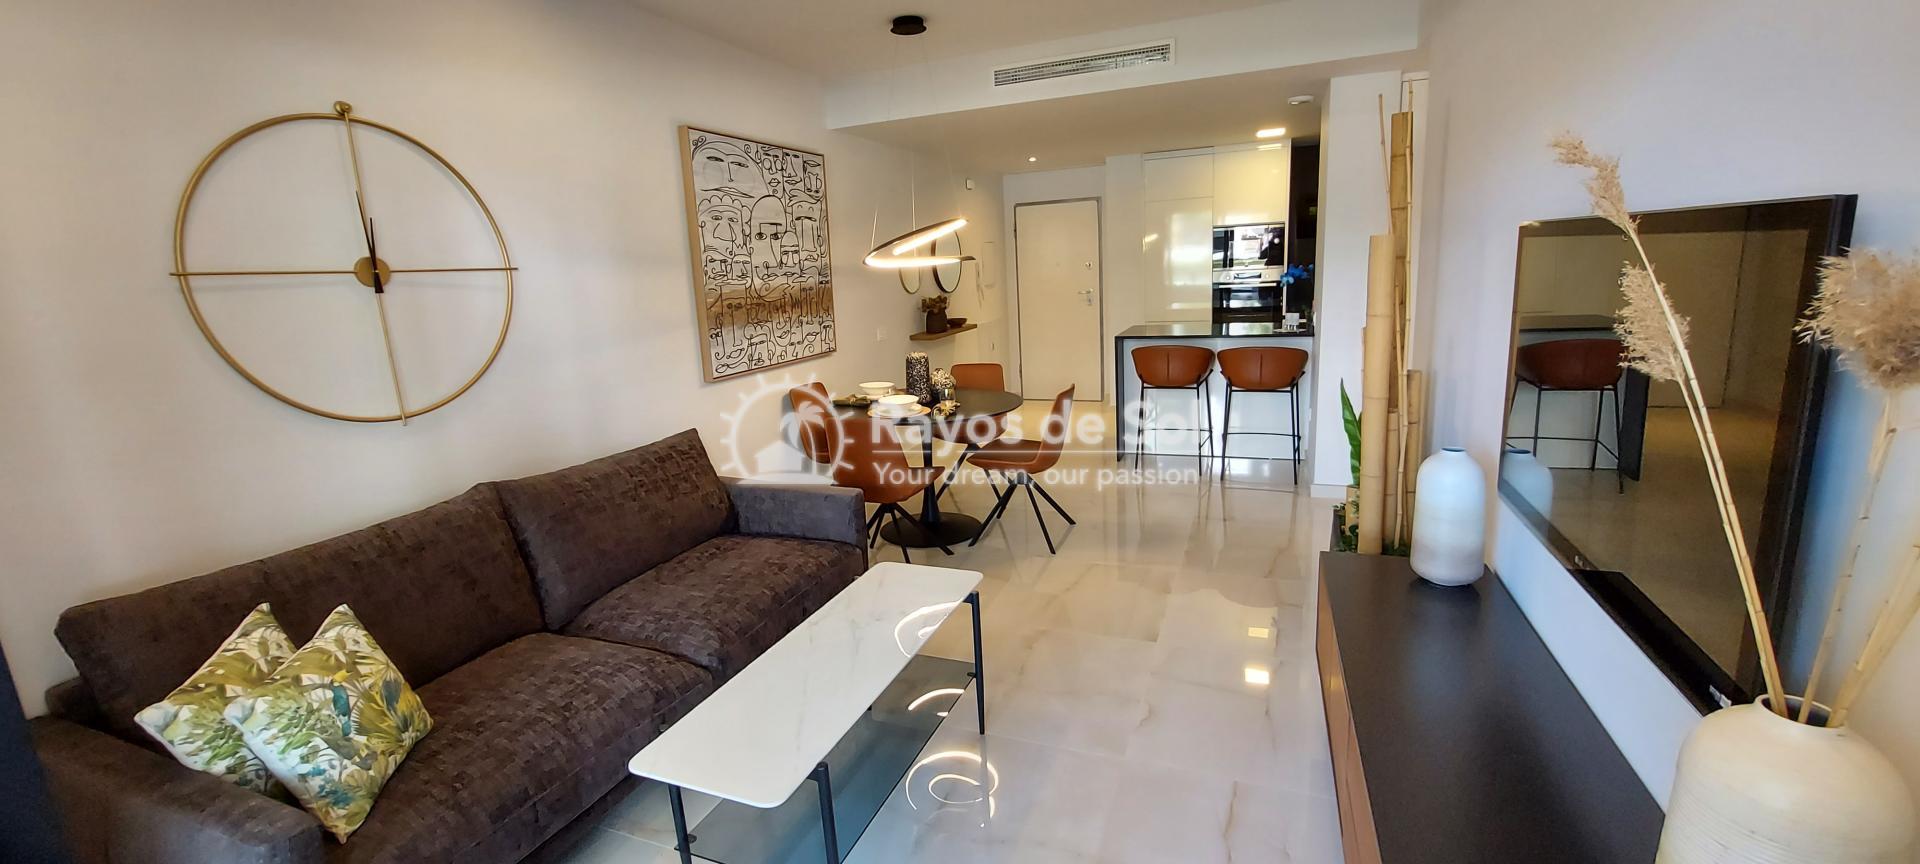 Apartment ground floor  in Orihuela Costa, Costa Blanca (amanecer6-gf-3d) - 2